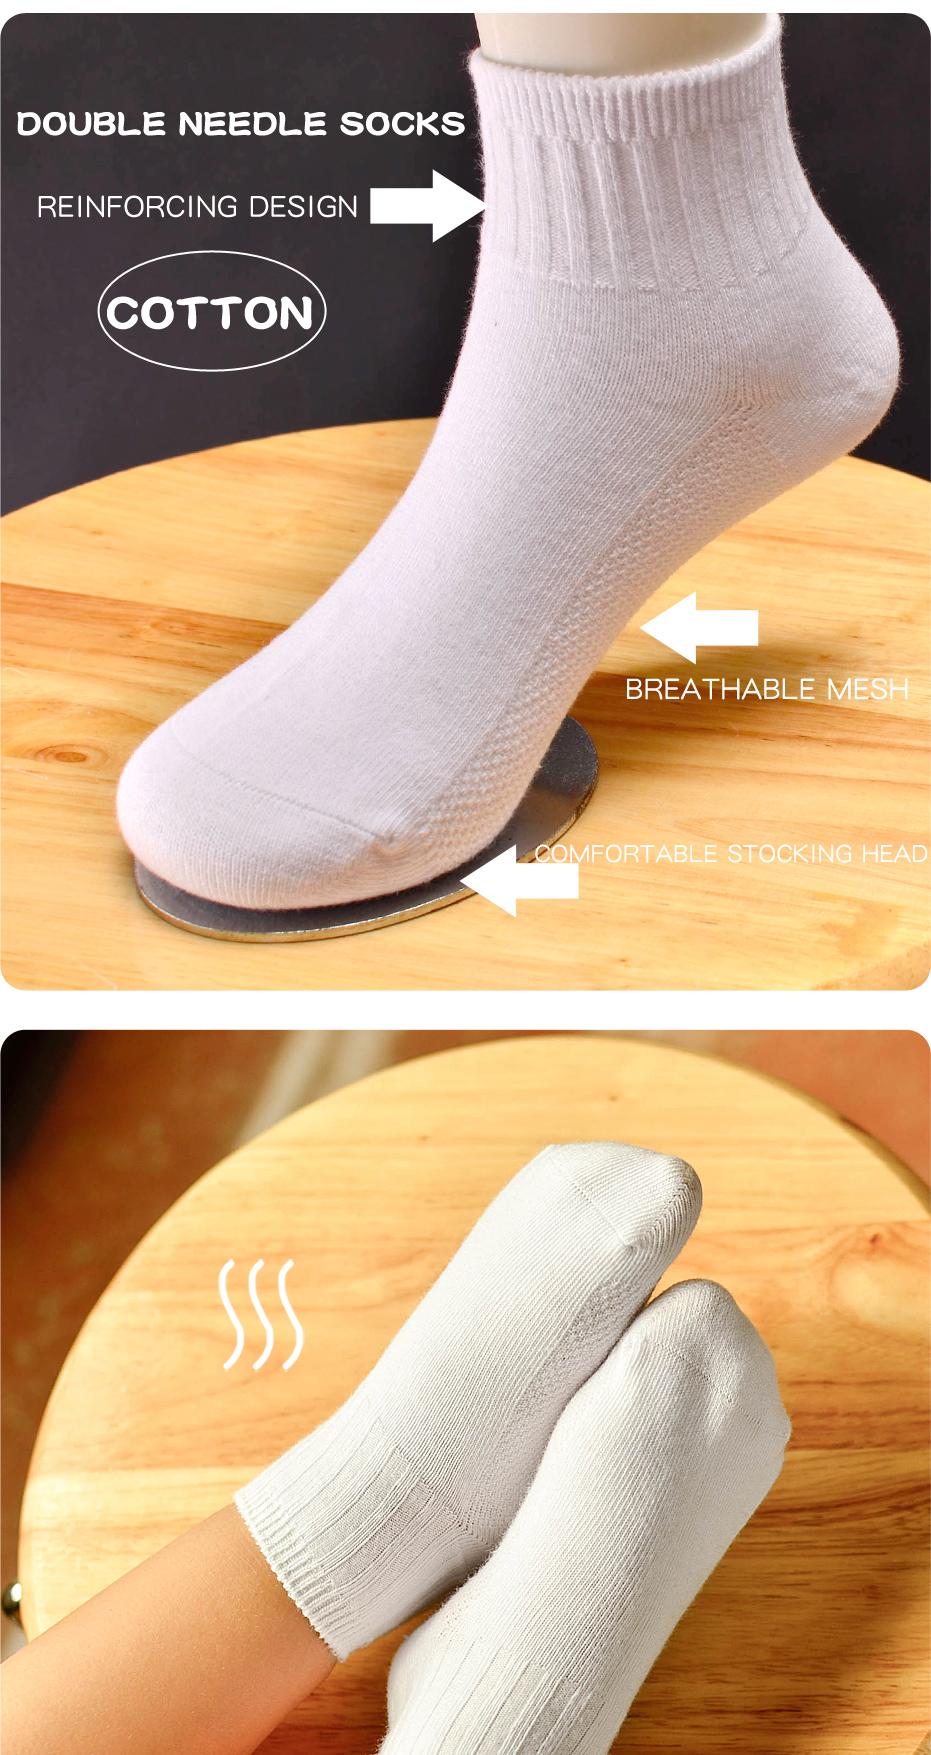 Double-needle-socks-description_01